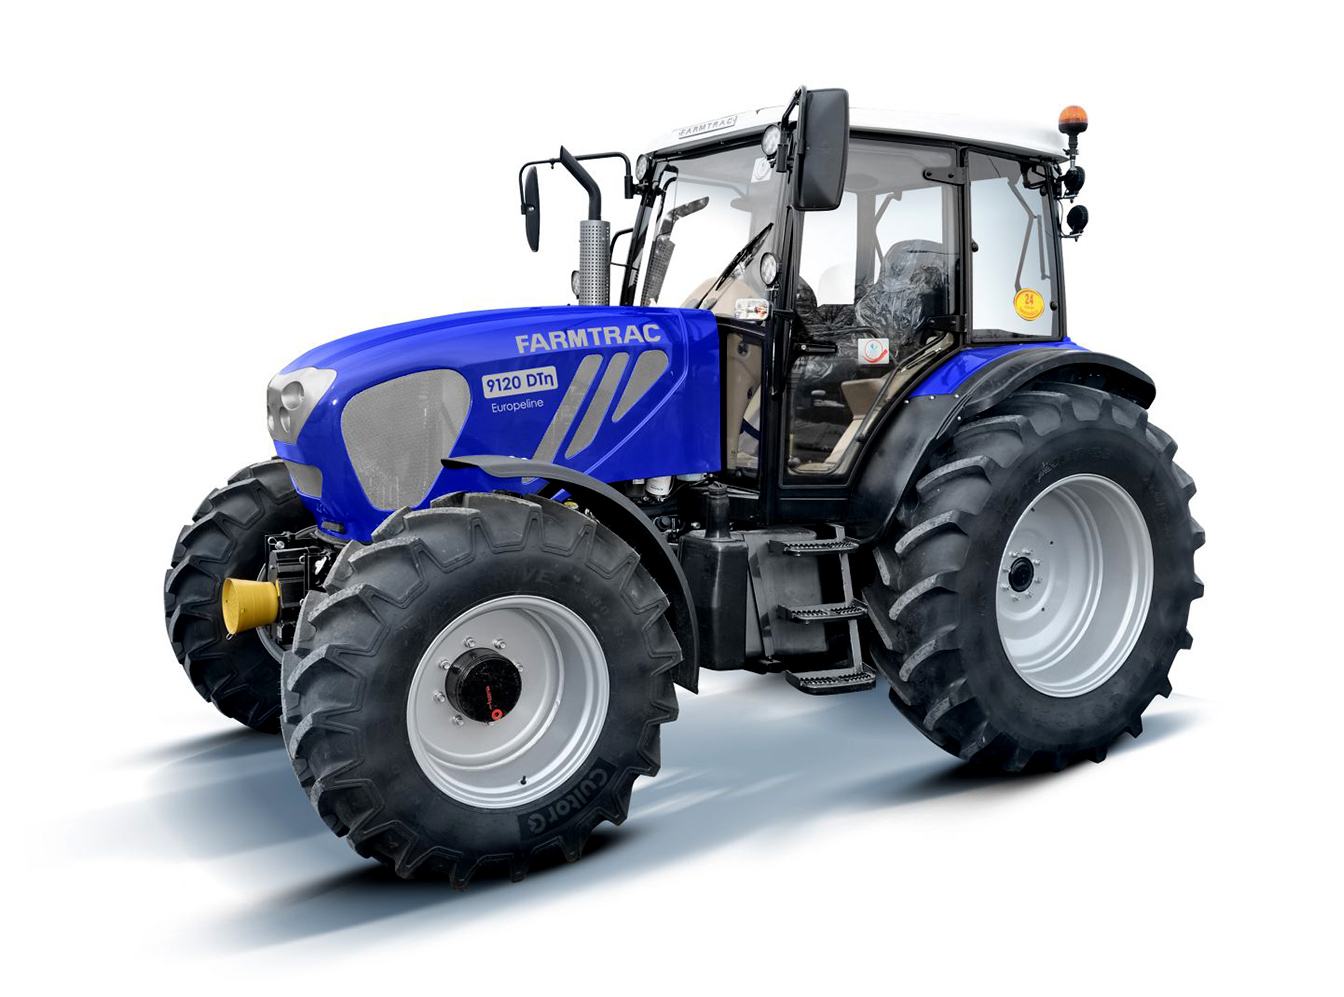 Traktor Farmtrac 9120 DTn